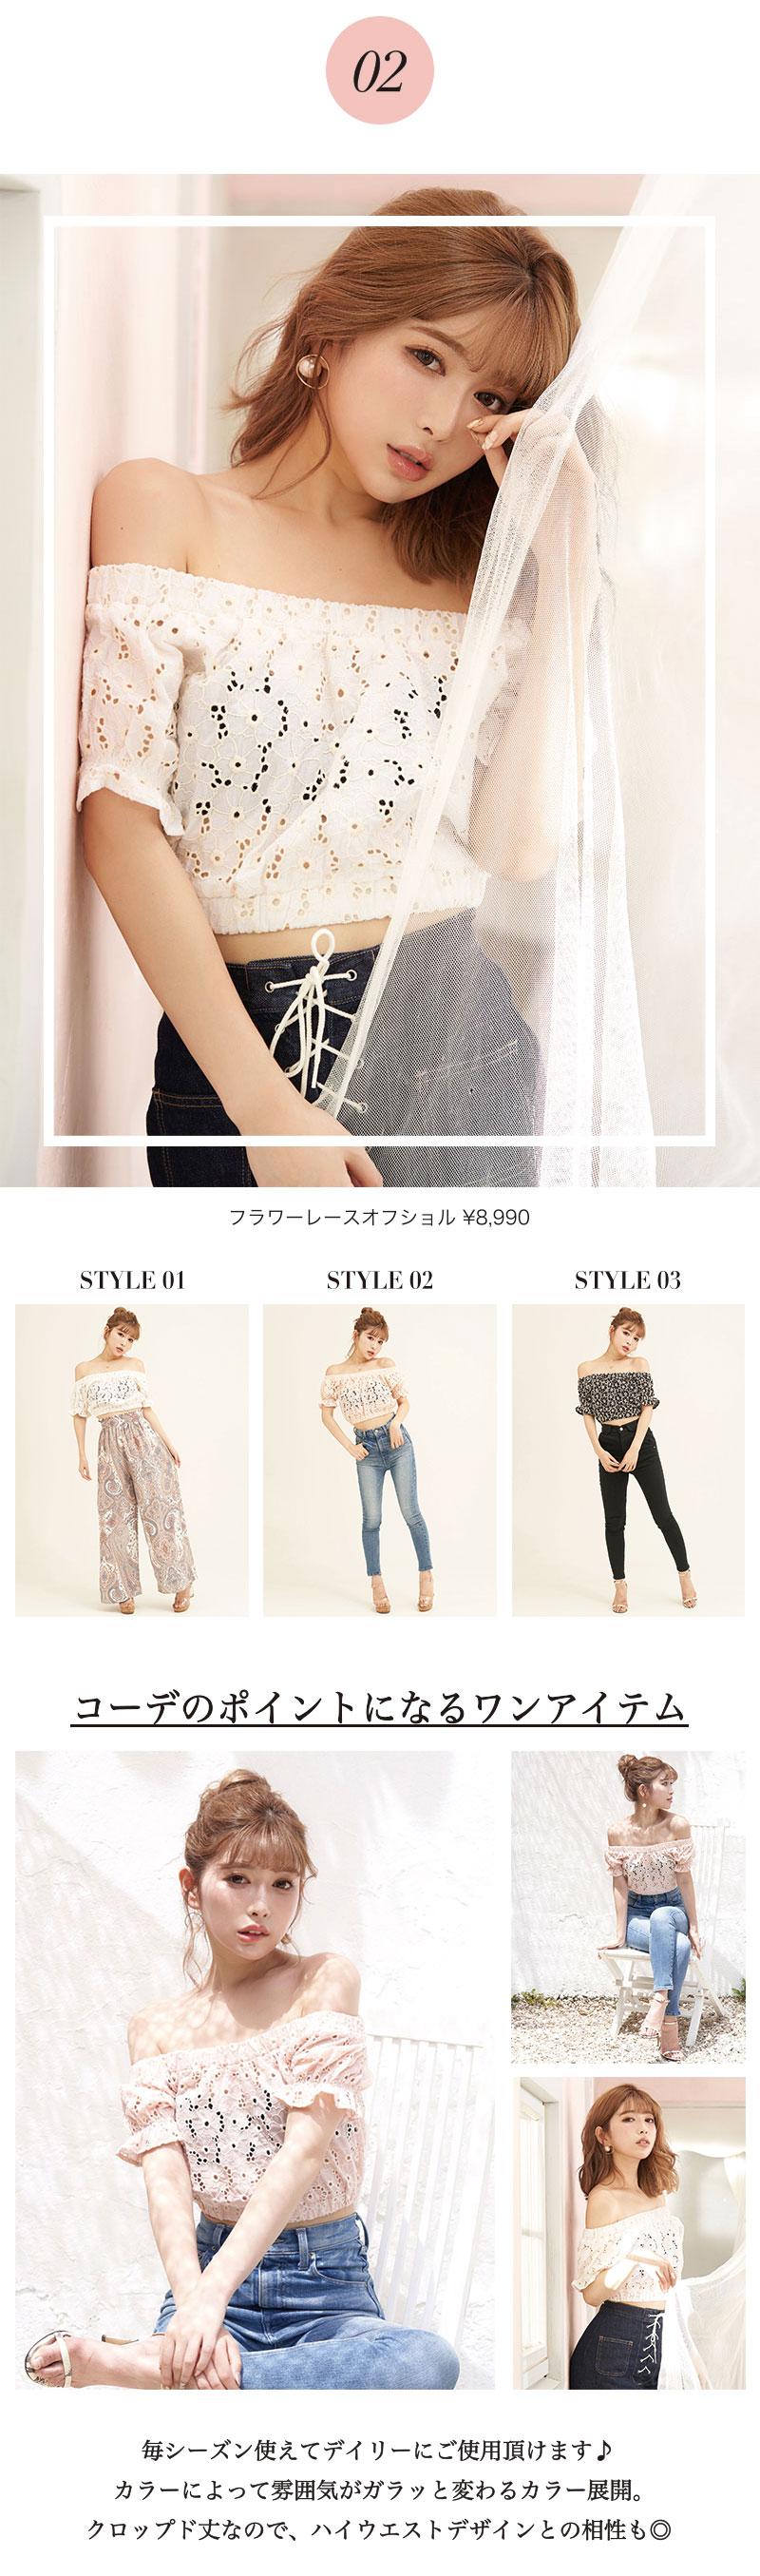 18SS トップスコレクション特集4